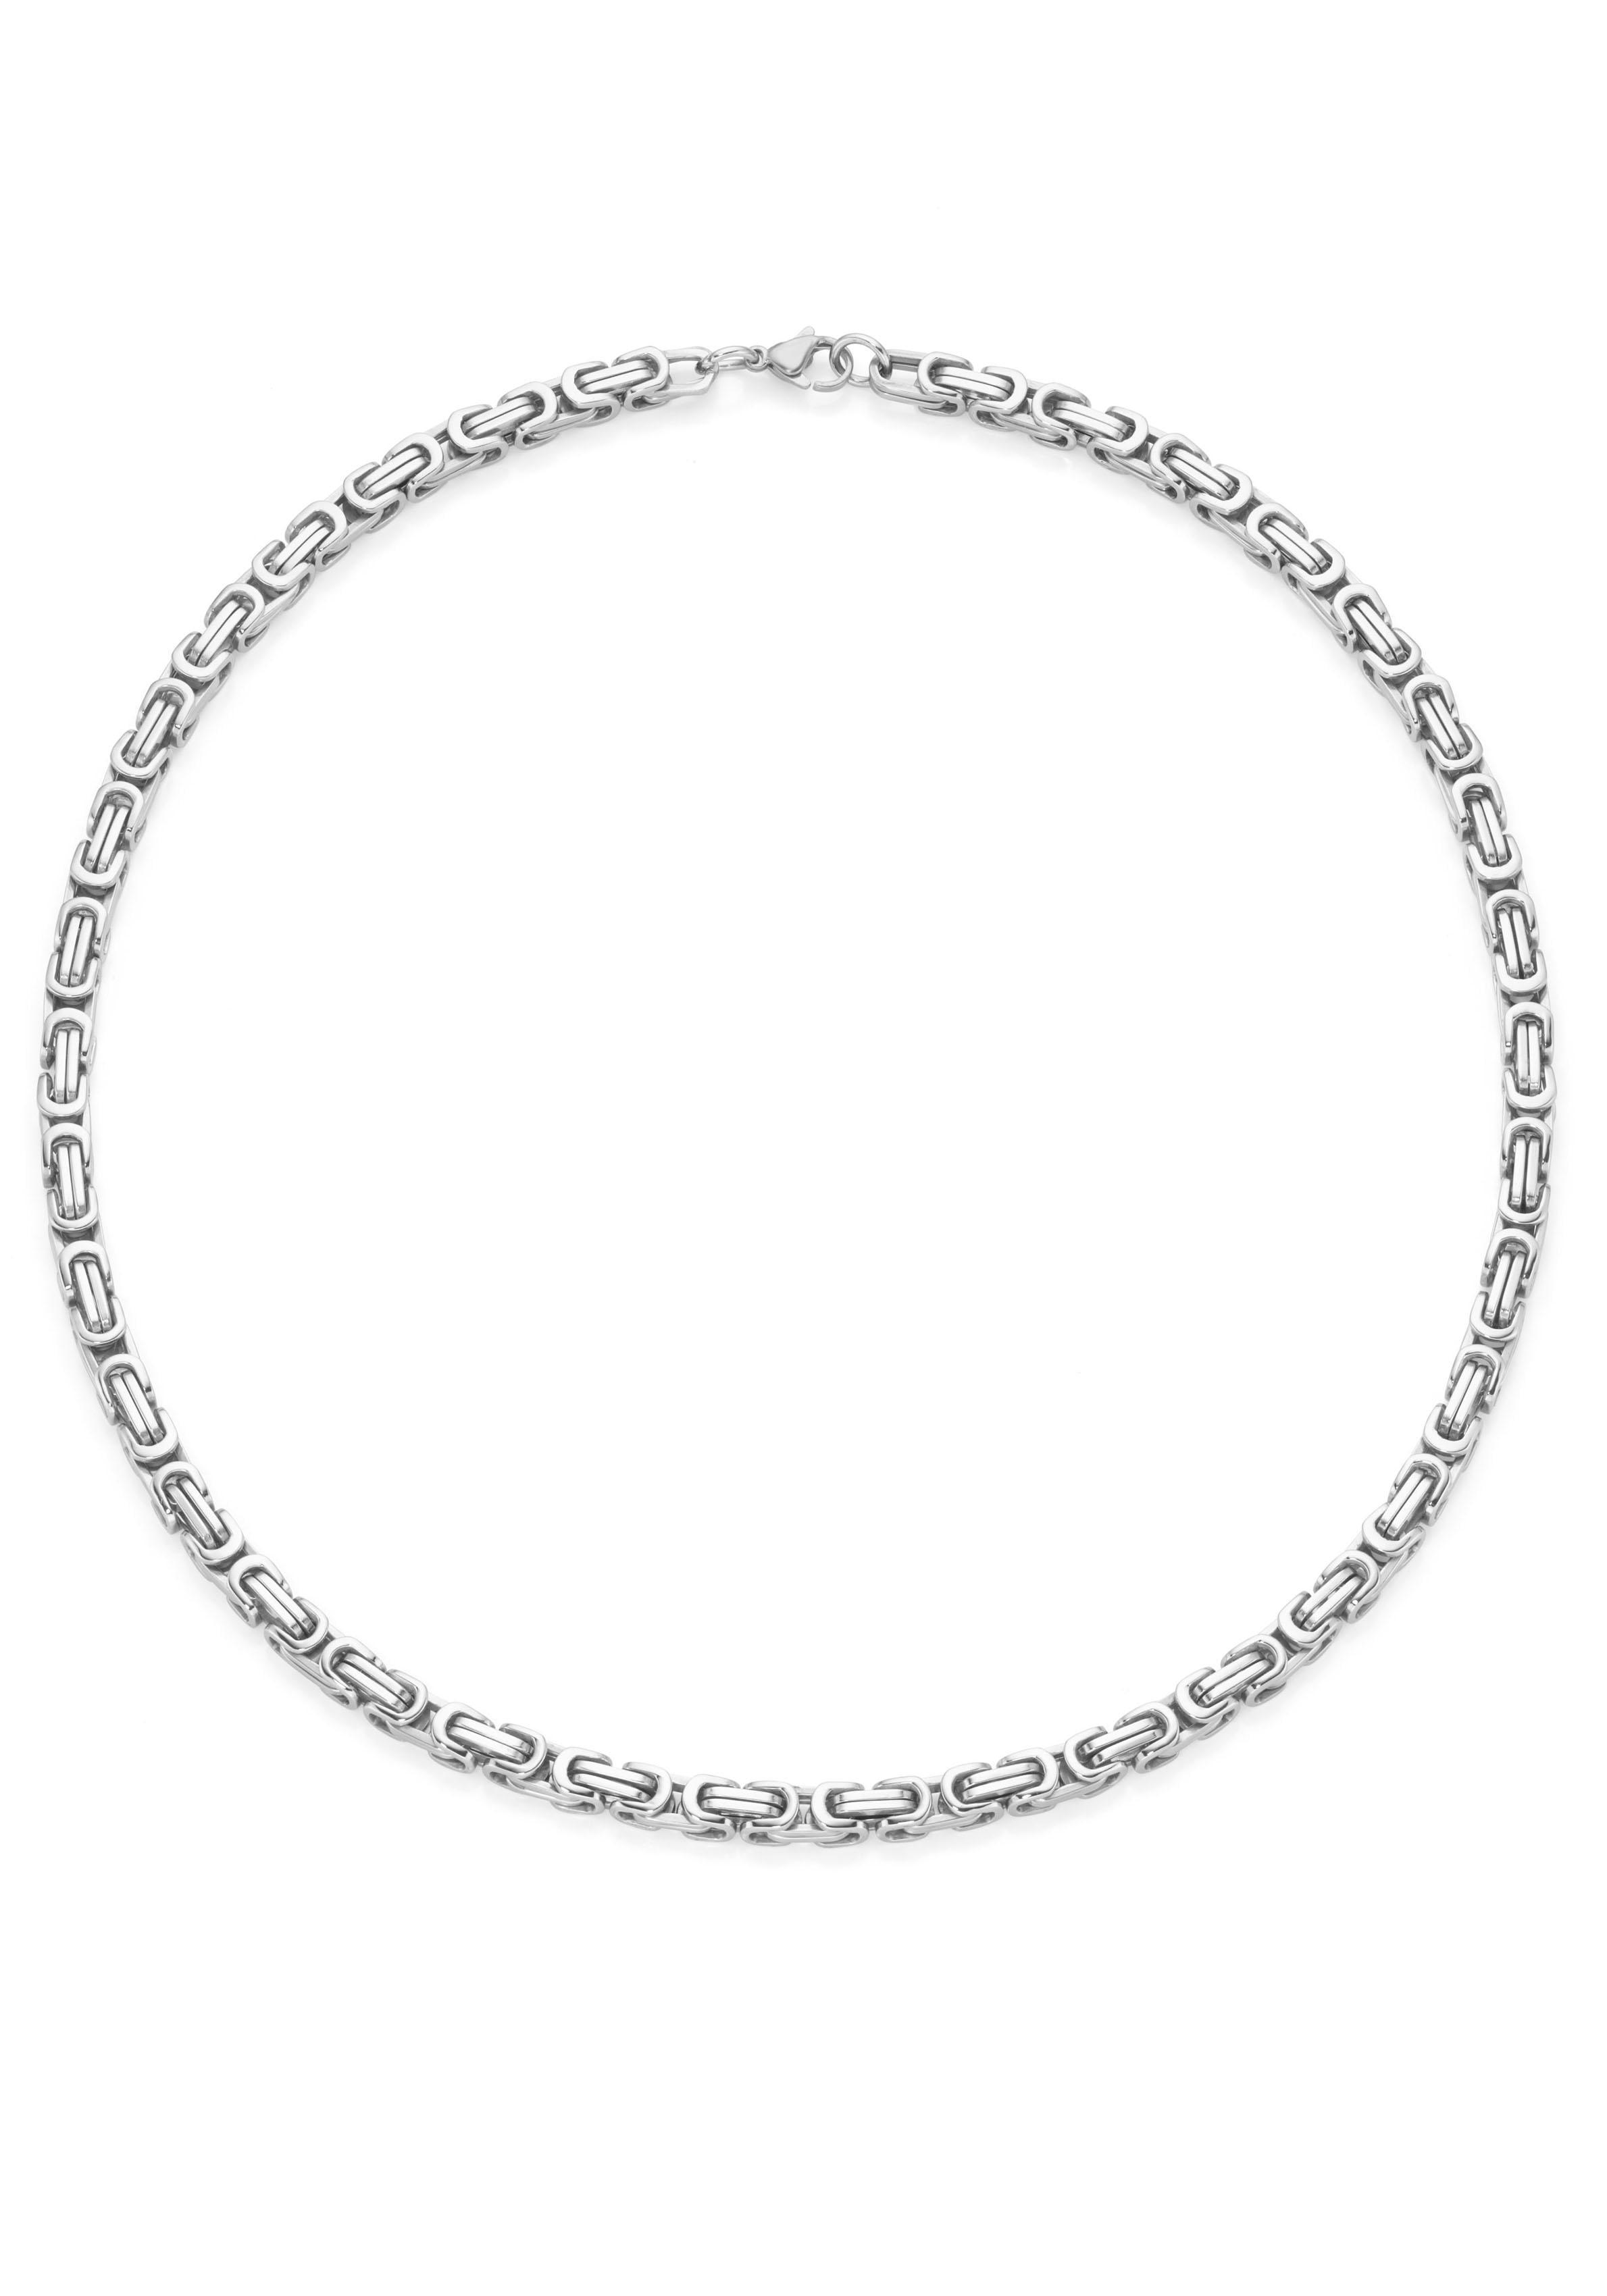 Firetti Königskette ca 55 mm breit massiv glänzend   Schmuck   Firetti